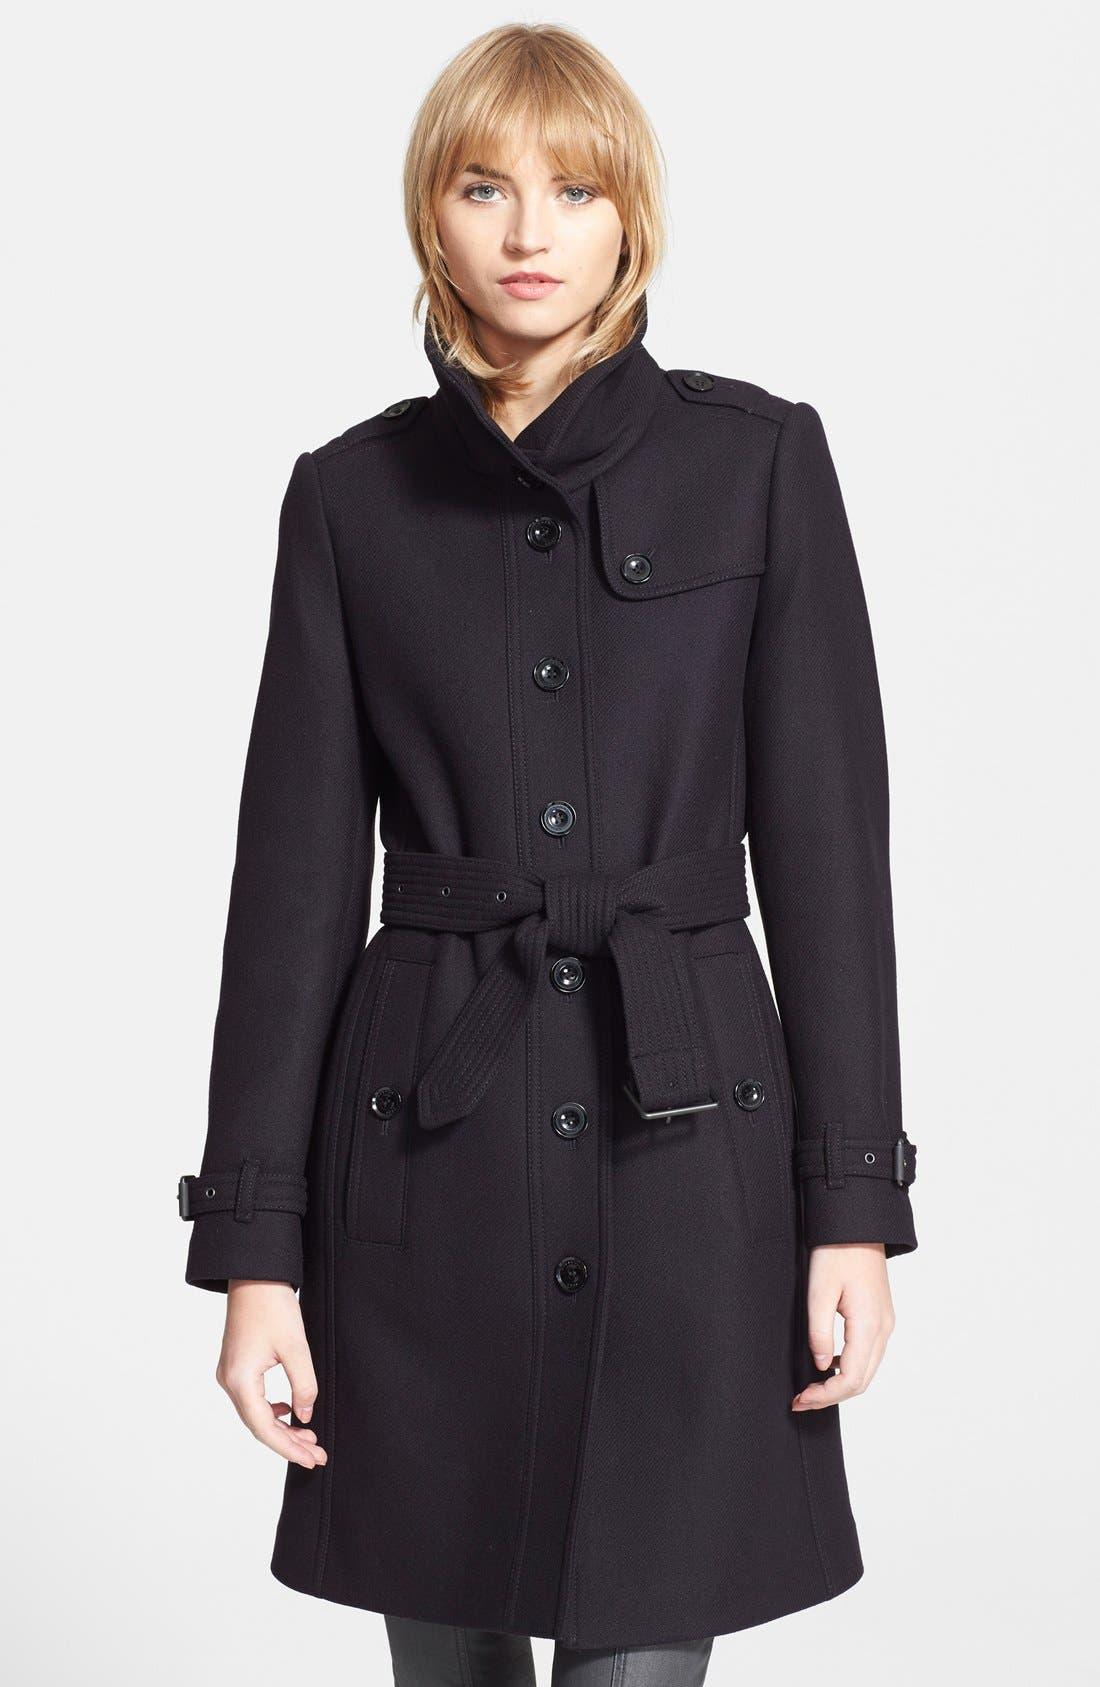 Alternate Image 1 Selected - Burberry Brit 'Rushfield' Wool Blend Stand Collar Coat